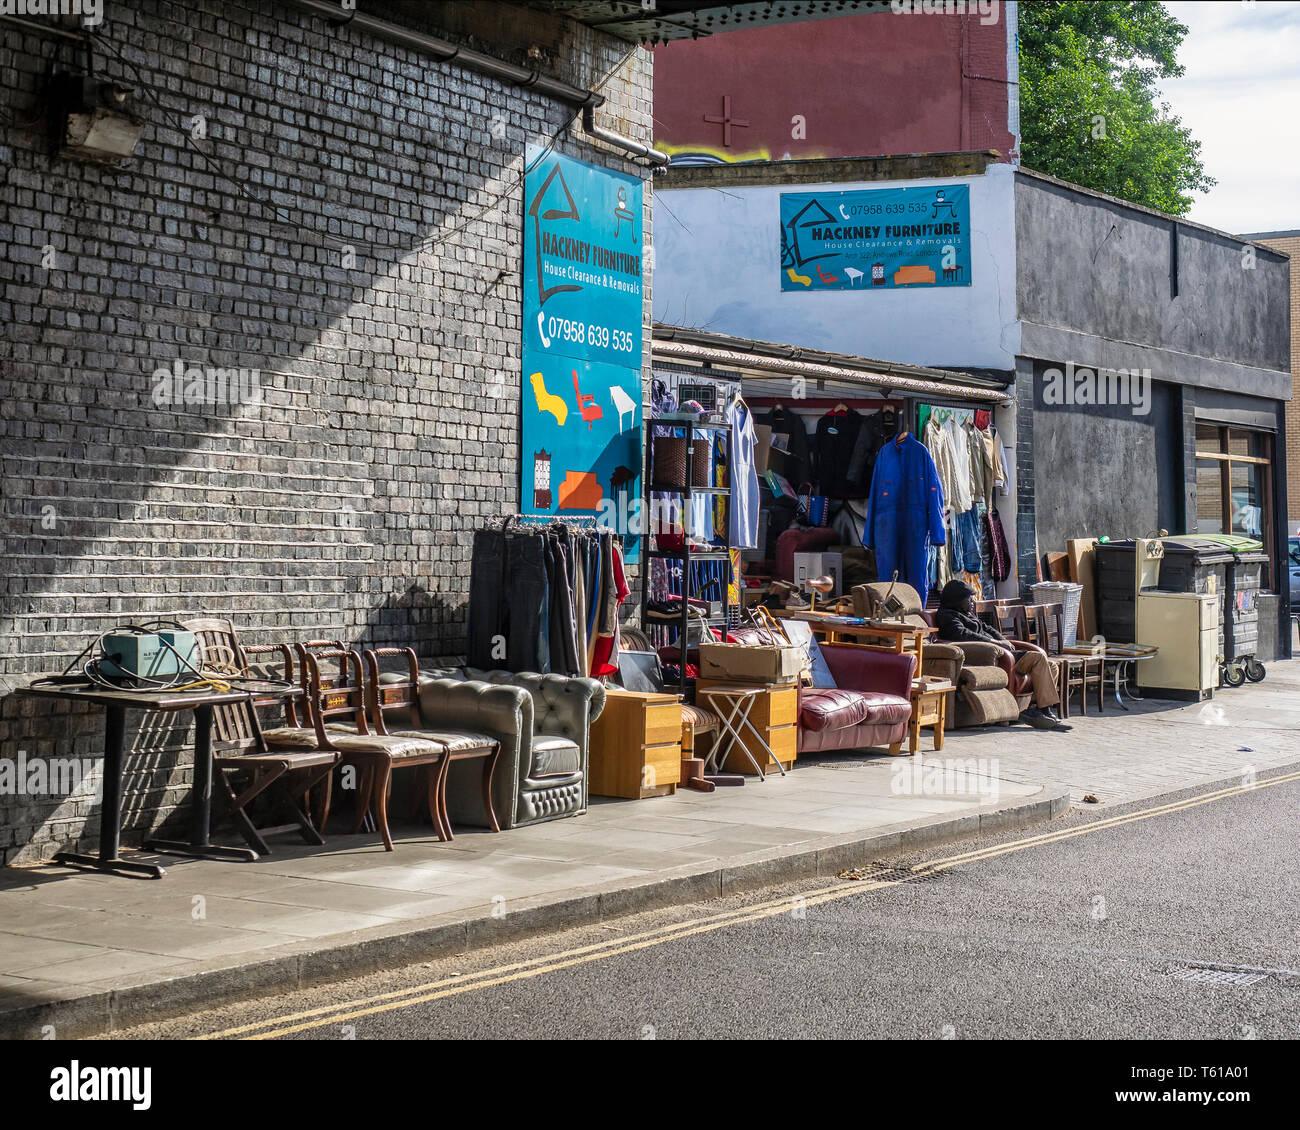 HYACKNEY, LONDON: 2nd Hand Furniture Shop - Stock Image